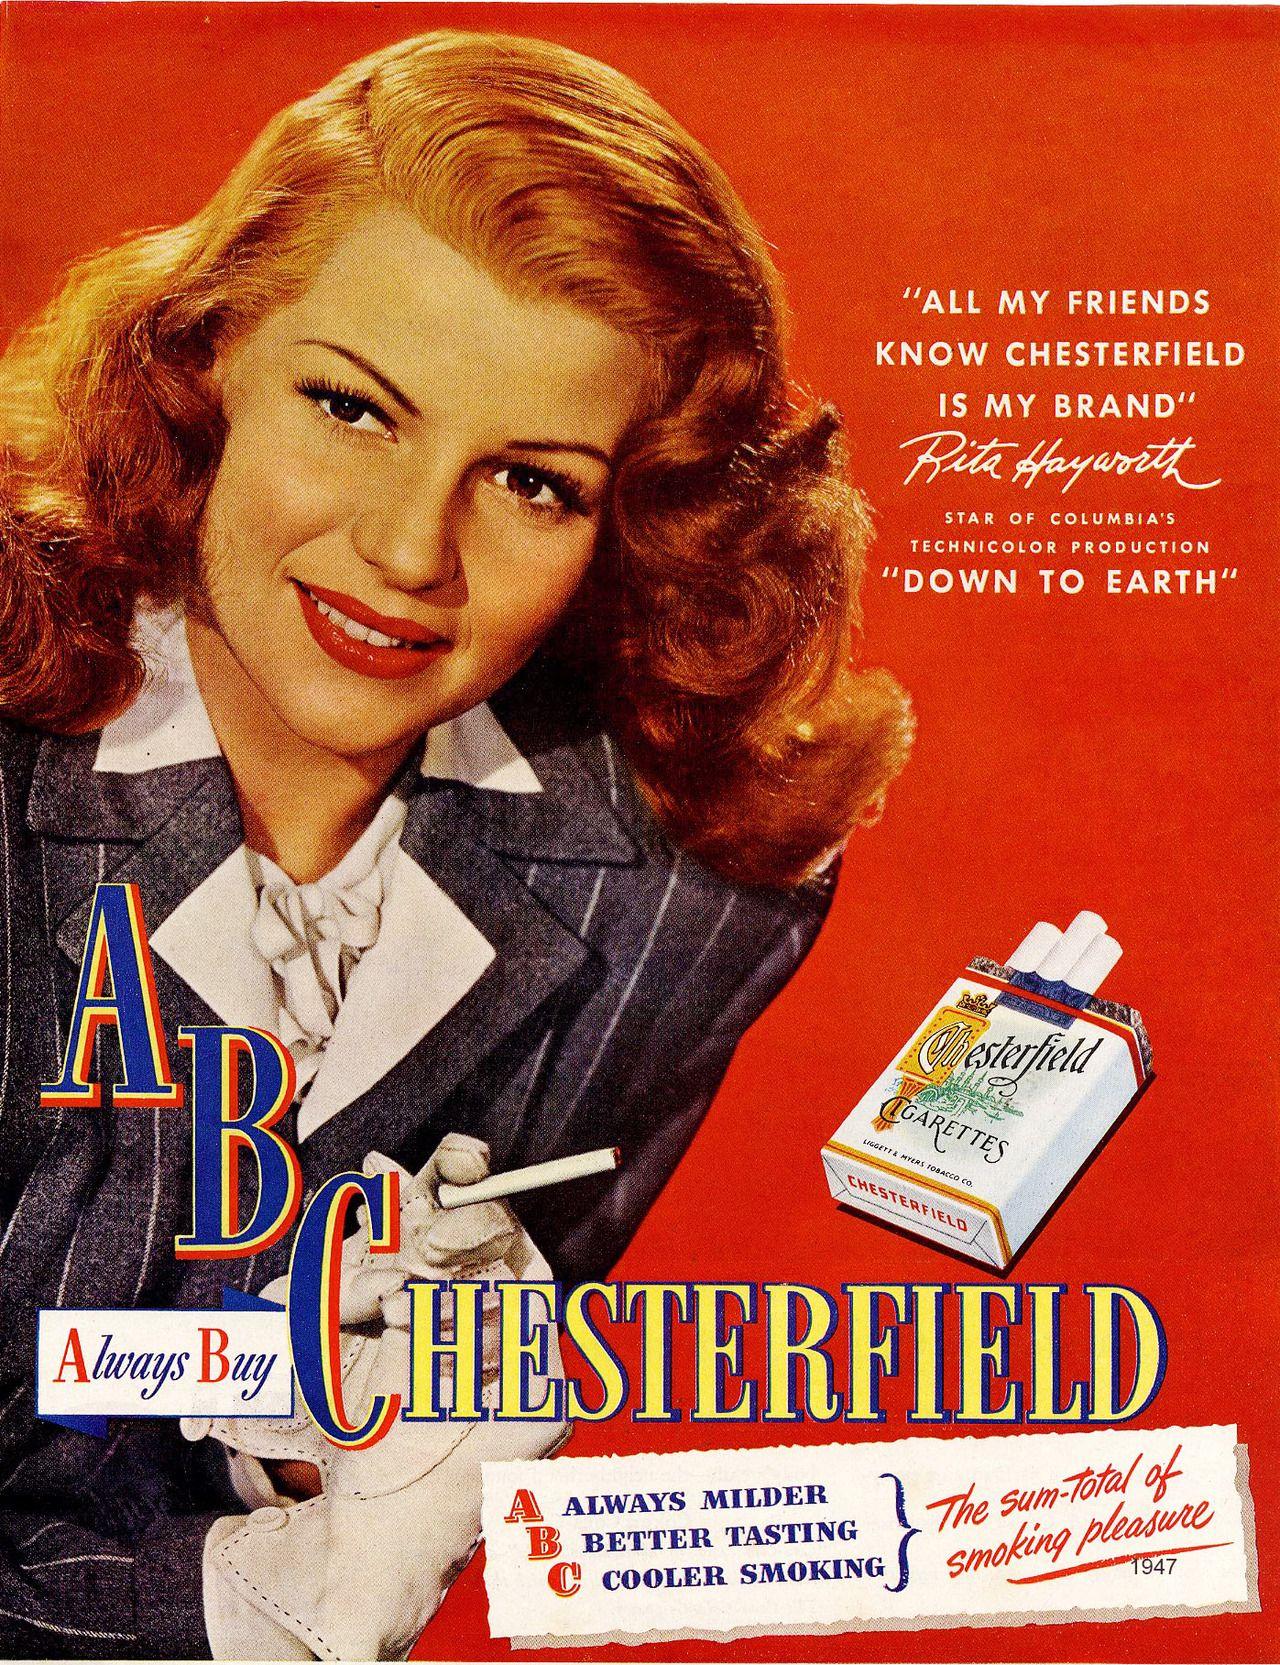 b2c4dbcf Chesterfield cigarettes ads | vintage cigarette posters | Vintage ...